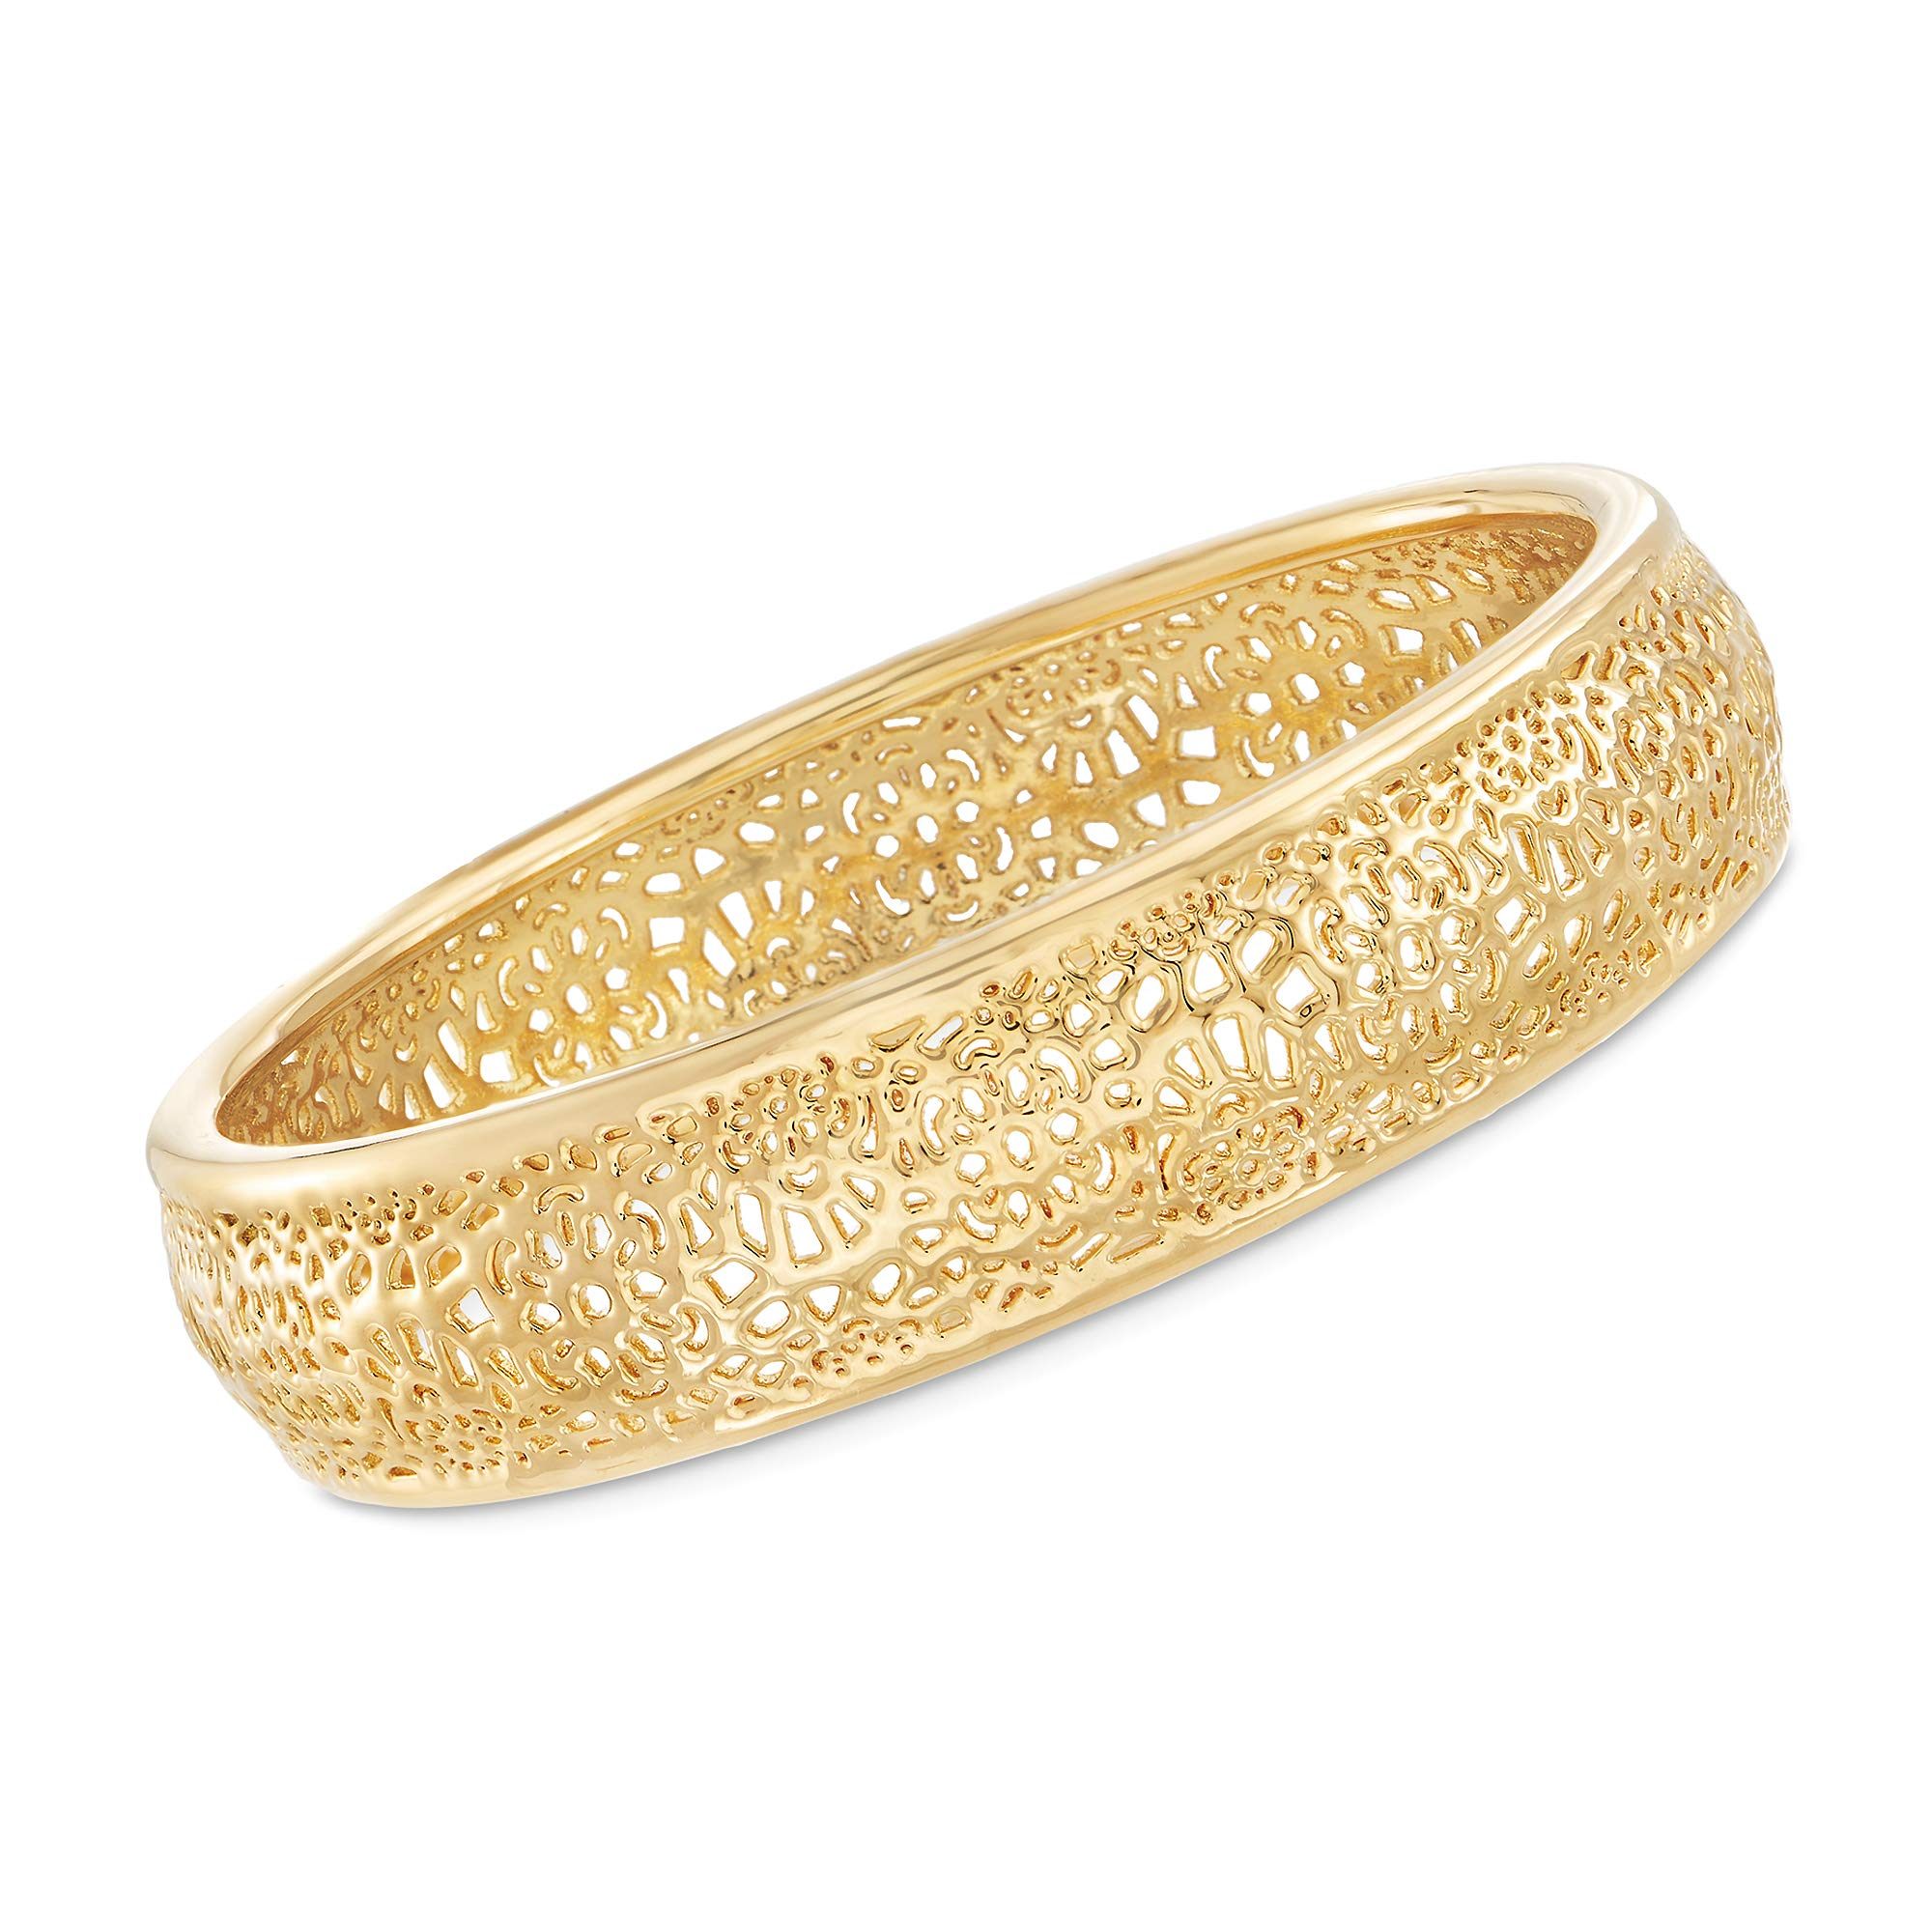 Ross-Simons Andiamo 14kt Yellow Gold Openwork Bangle Bracelet